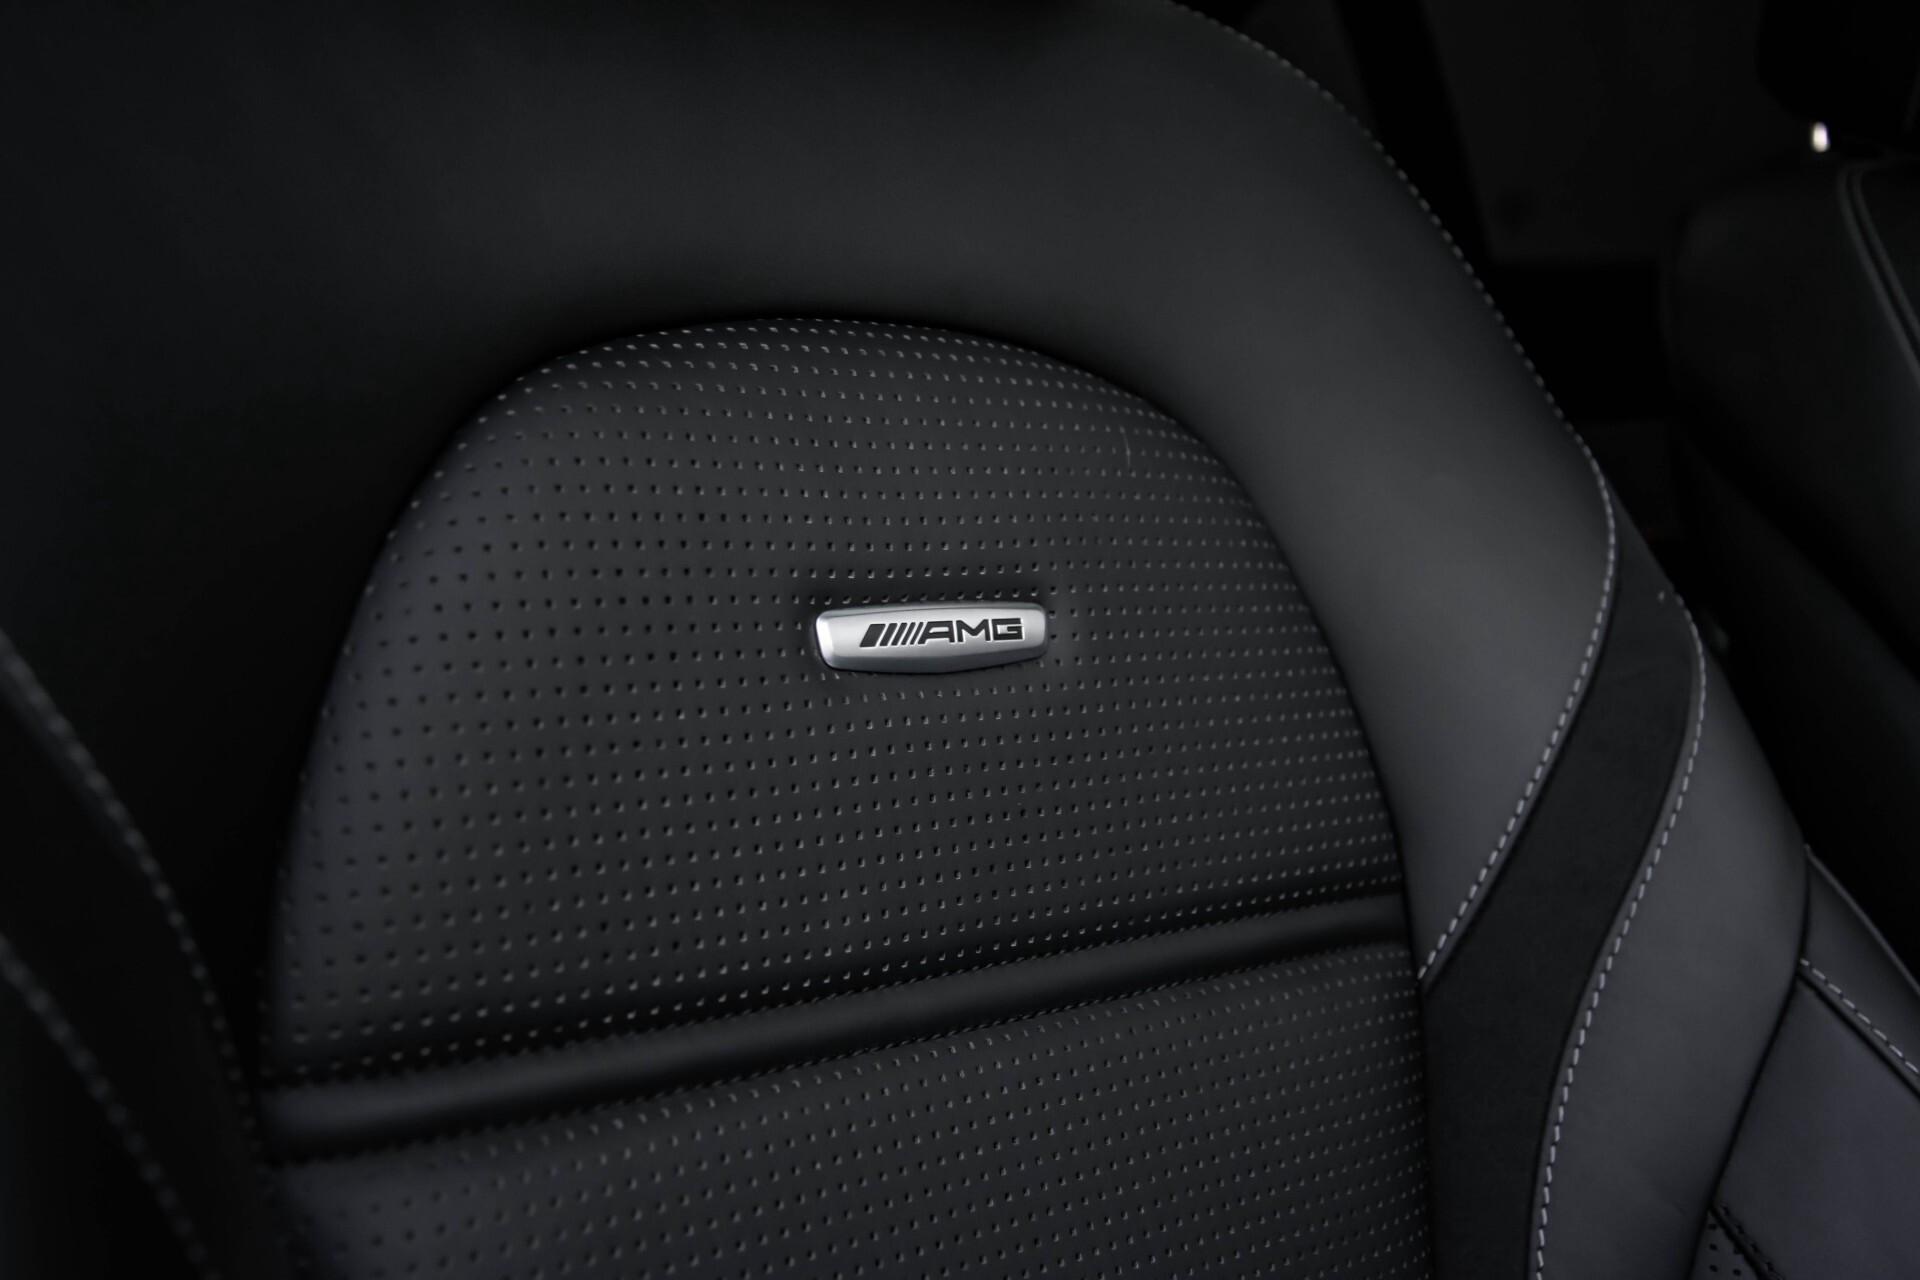 Mercedes-Benz C-Klasse 63 AMG S Panorama/Distronic/Keyless/Comand/Camera/ILS Aut7 Foto 36